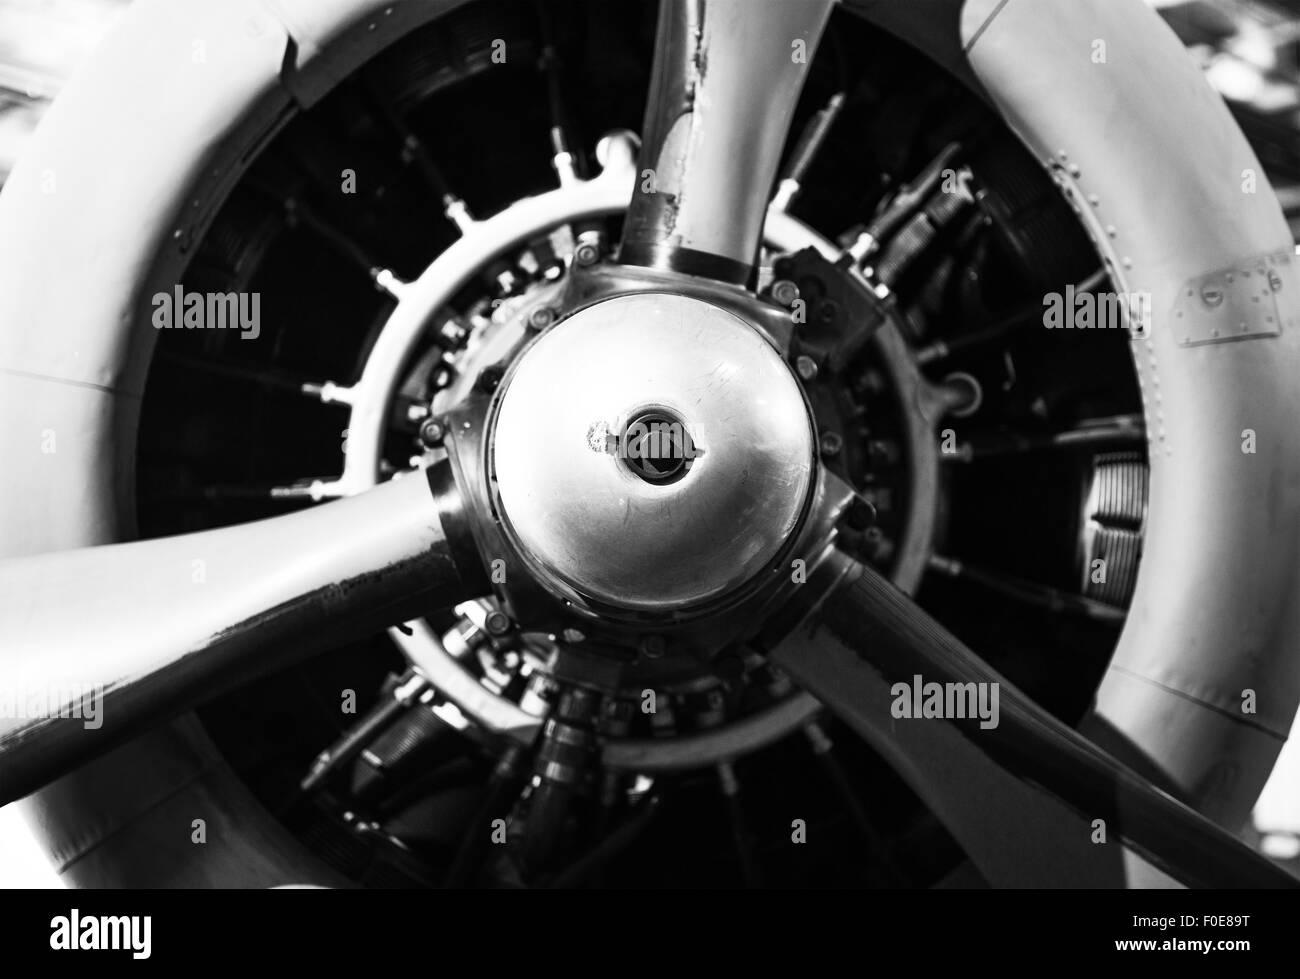 2b156e071de7 Vintage Aircraft Propeller with Radial Engine. World War II Combat Airplane  Closeup. - Stock